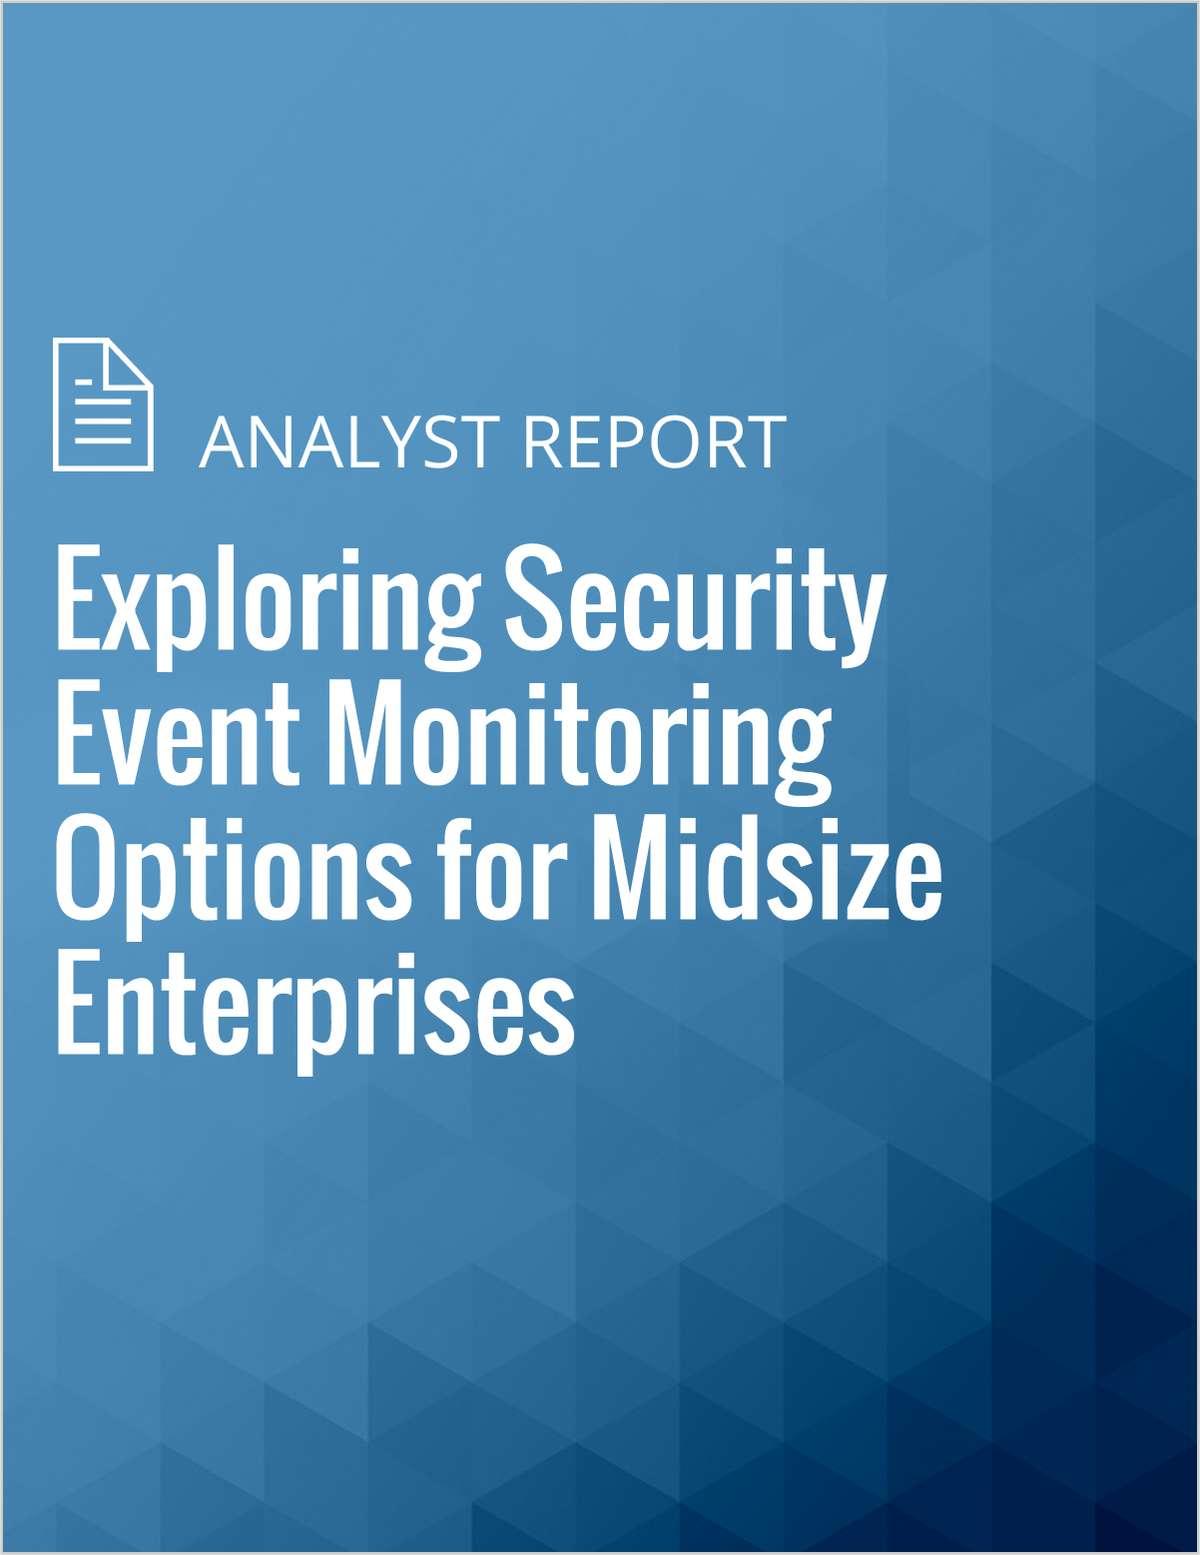 Exploring Security Event Monitoring Options for Midsize Enterprises